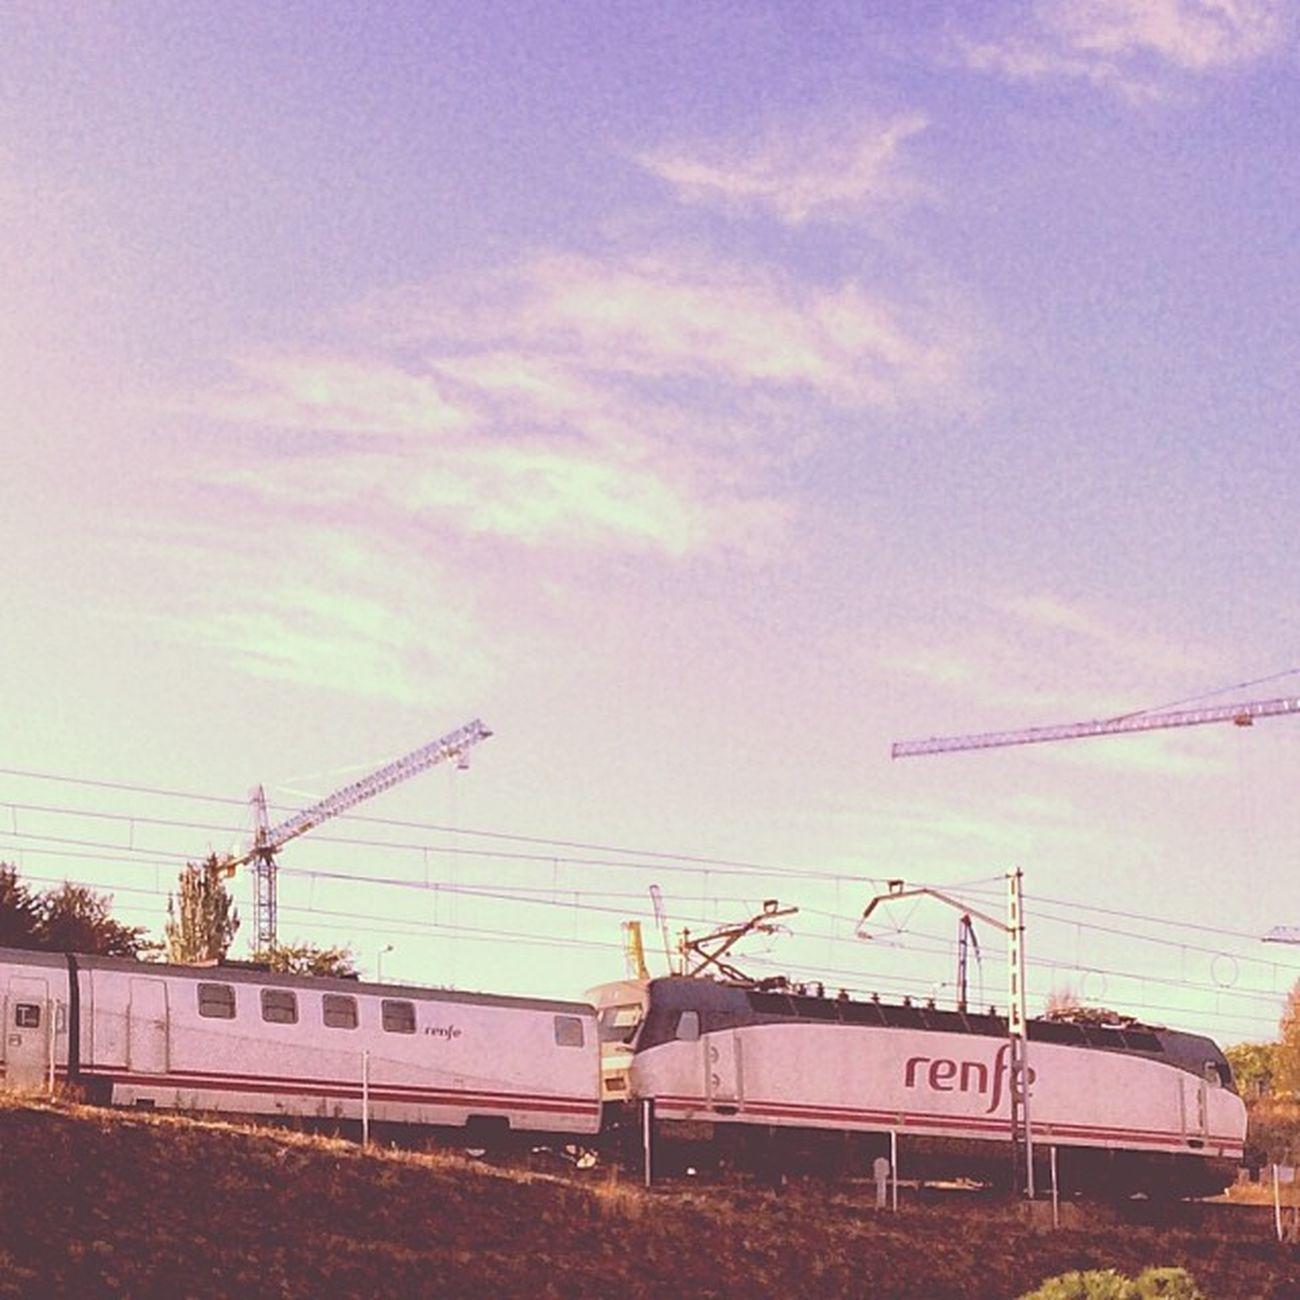 Morning train! Renfe 252 pantone, Talgo. Igersrenfe Igerstrains Igerstalgo Negugoring